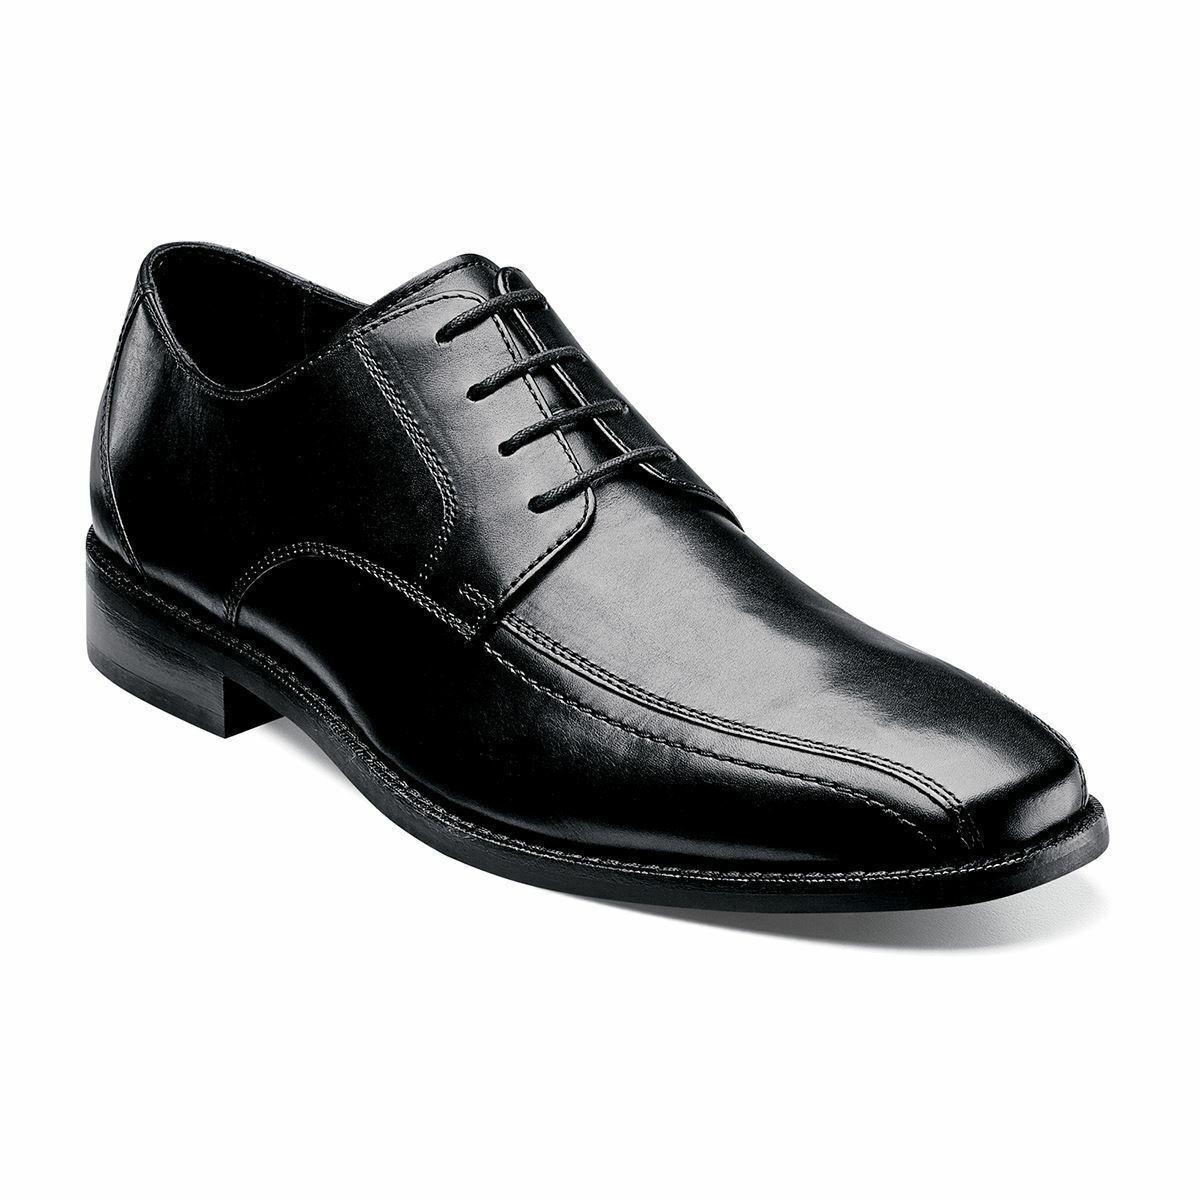 Florsheim Men's Castellano Bike Toe Oxford Black shoes 14139-001